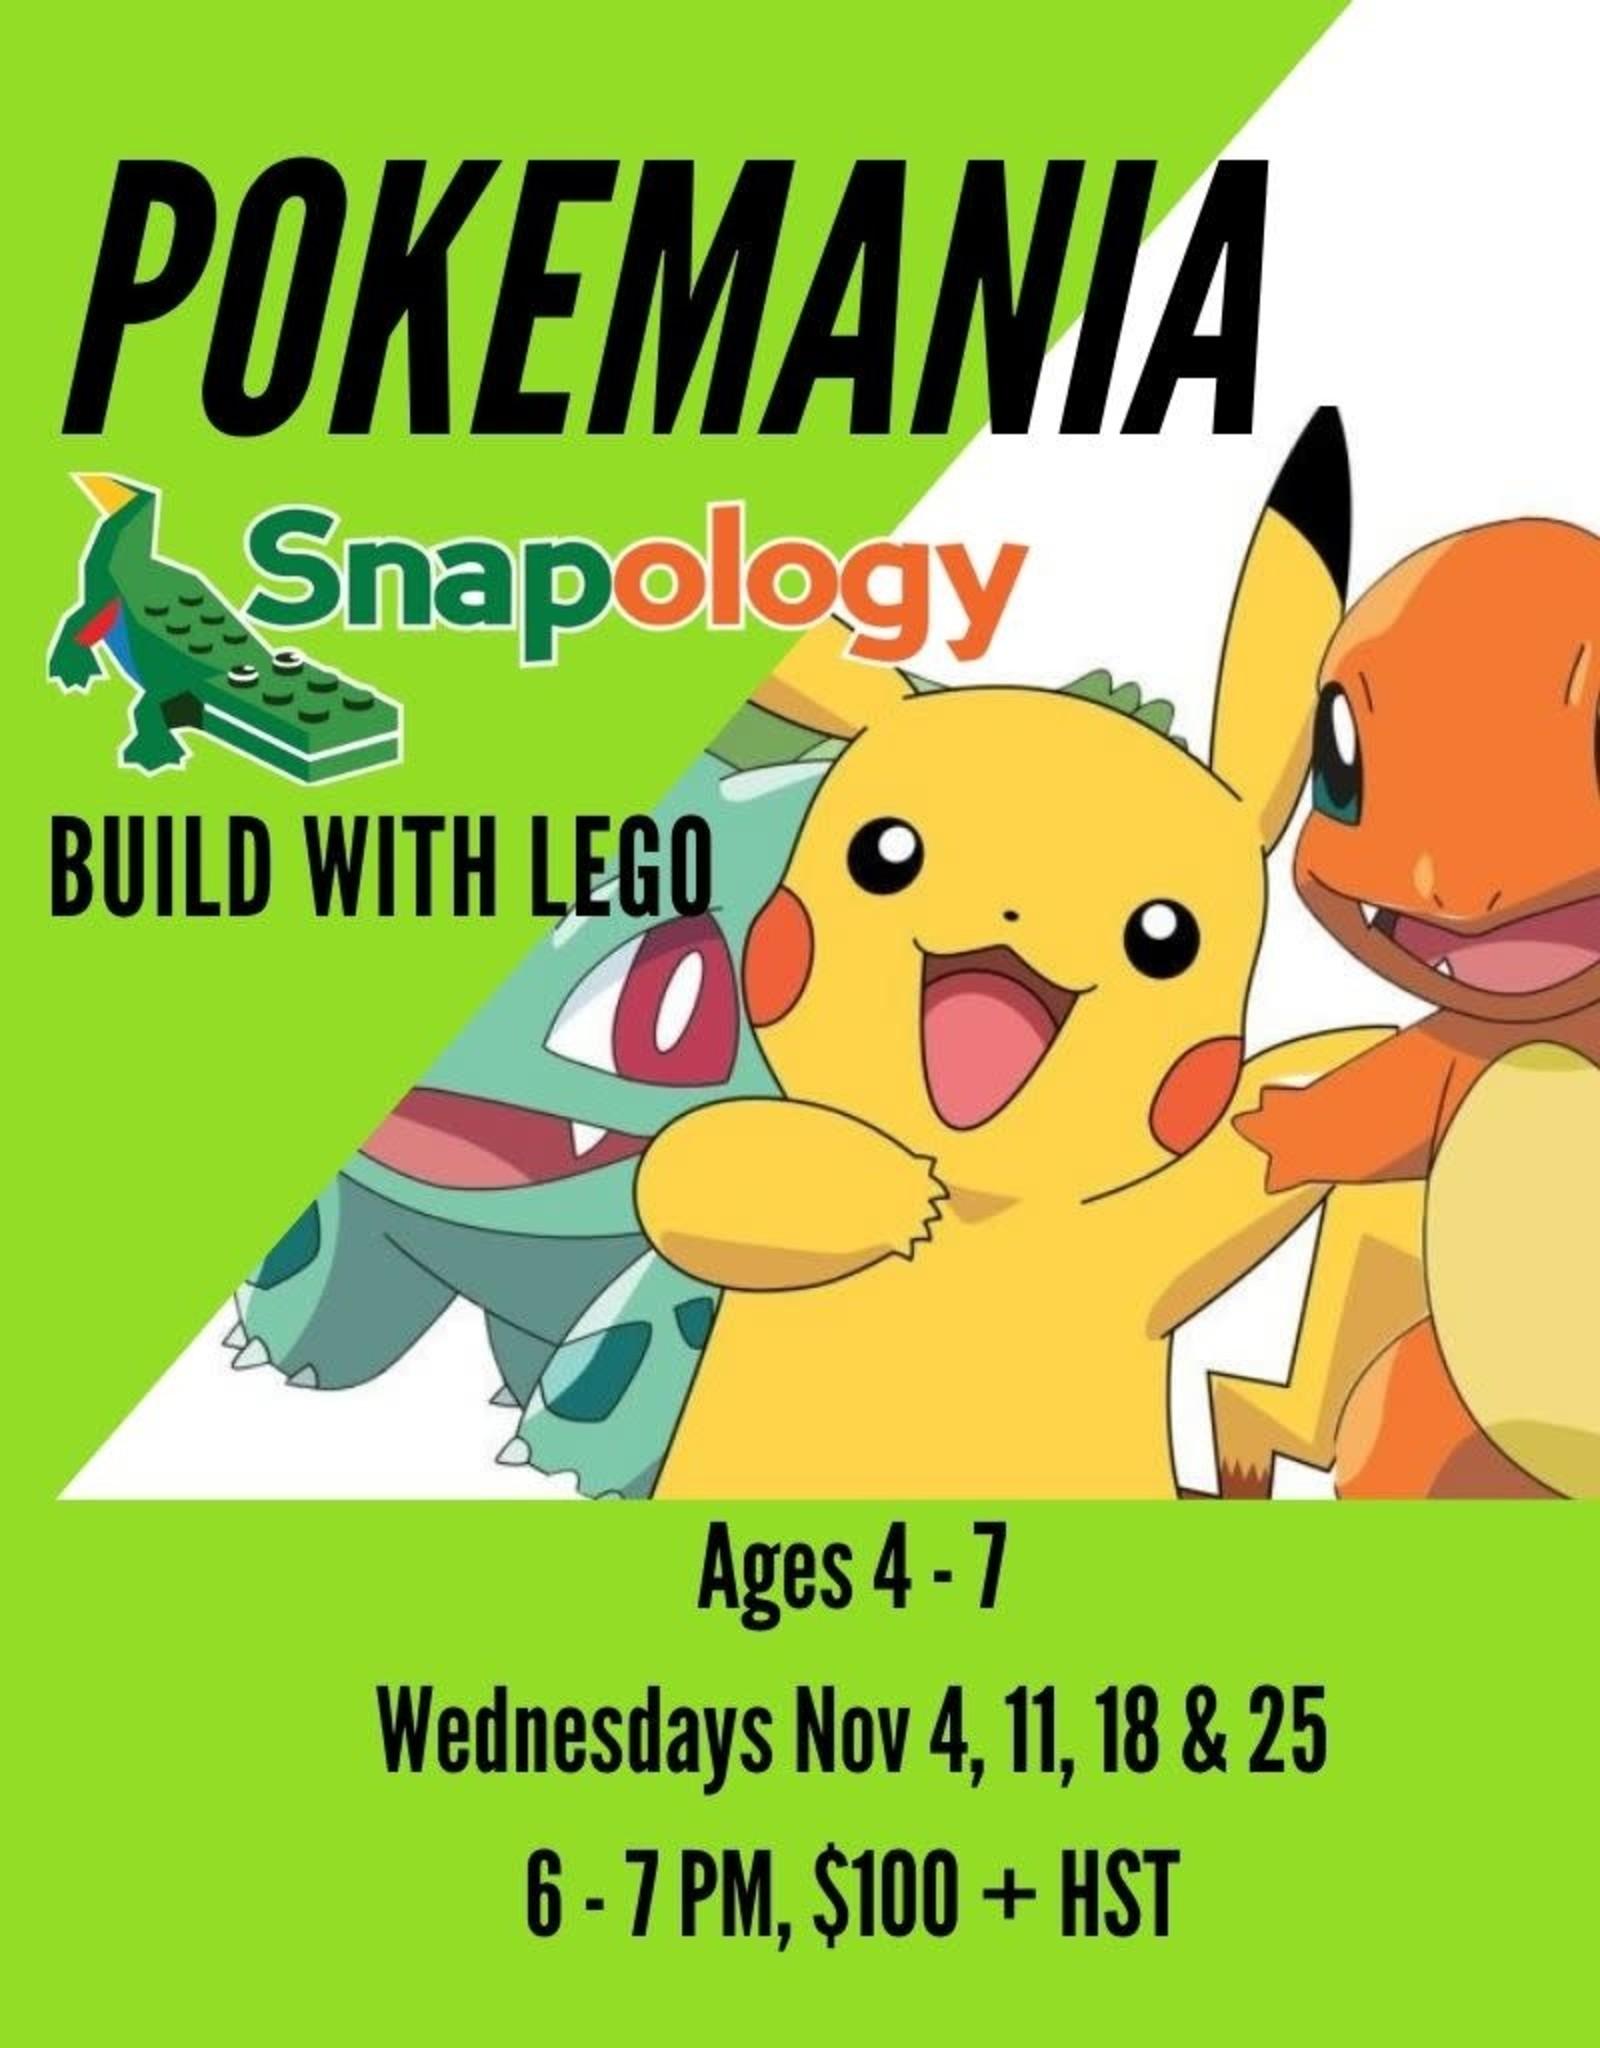 Pokemania Workshop with Snapology - Nov 4, 11, 18, 25